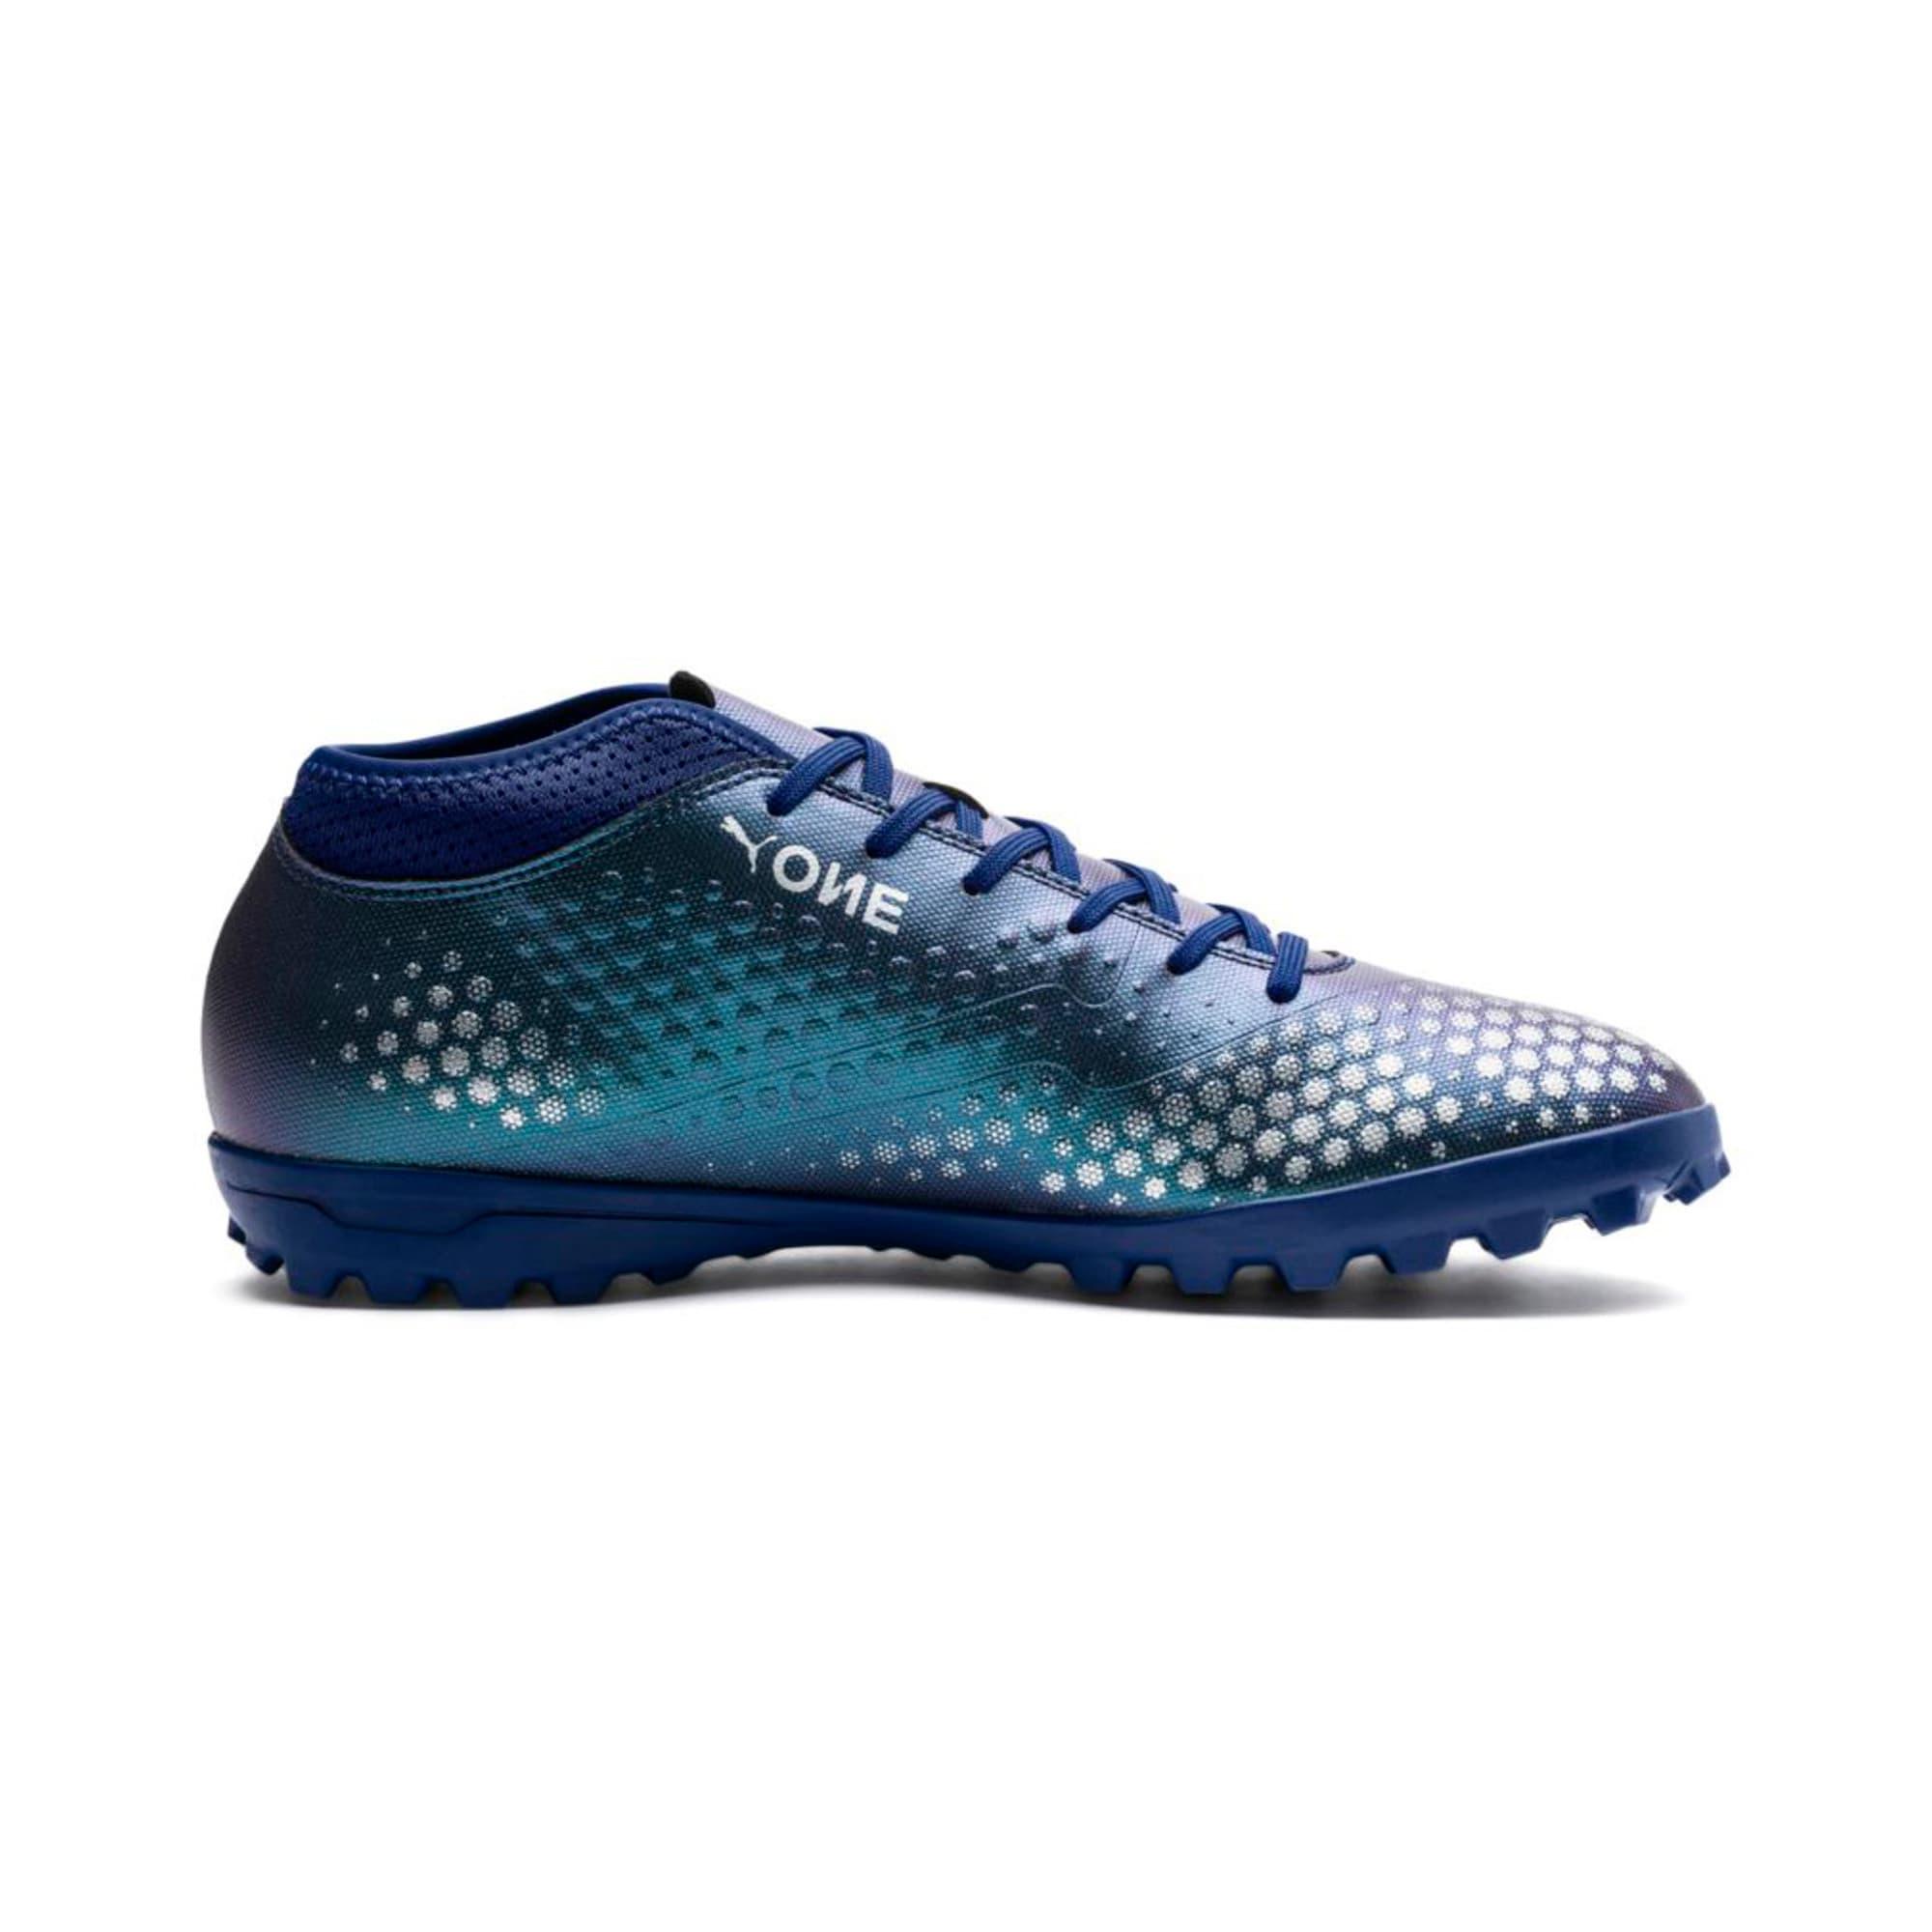 Thumbnail 5 of PUMA ONE 4 Synthetic TT Men's Football Boots, Sodalite Blue-Silver-Peacoat, medium-IND